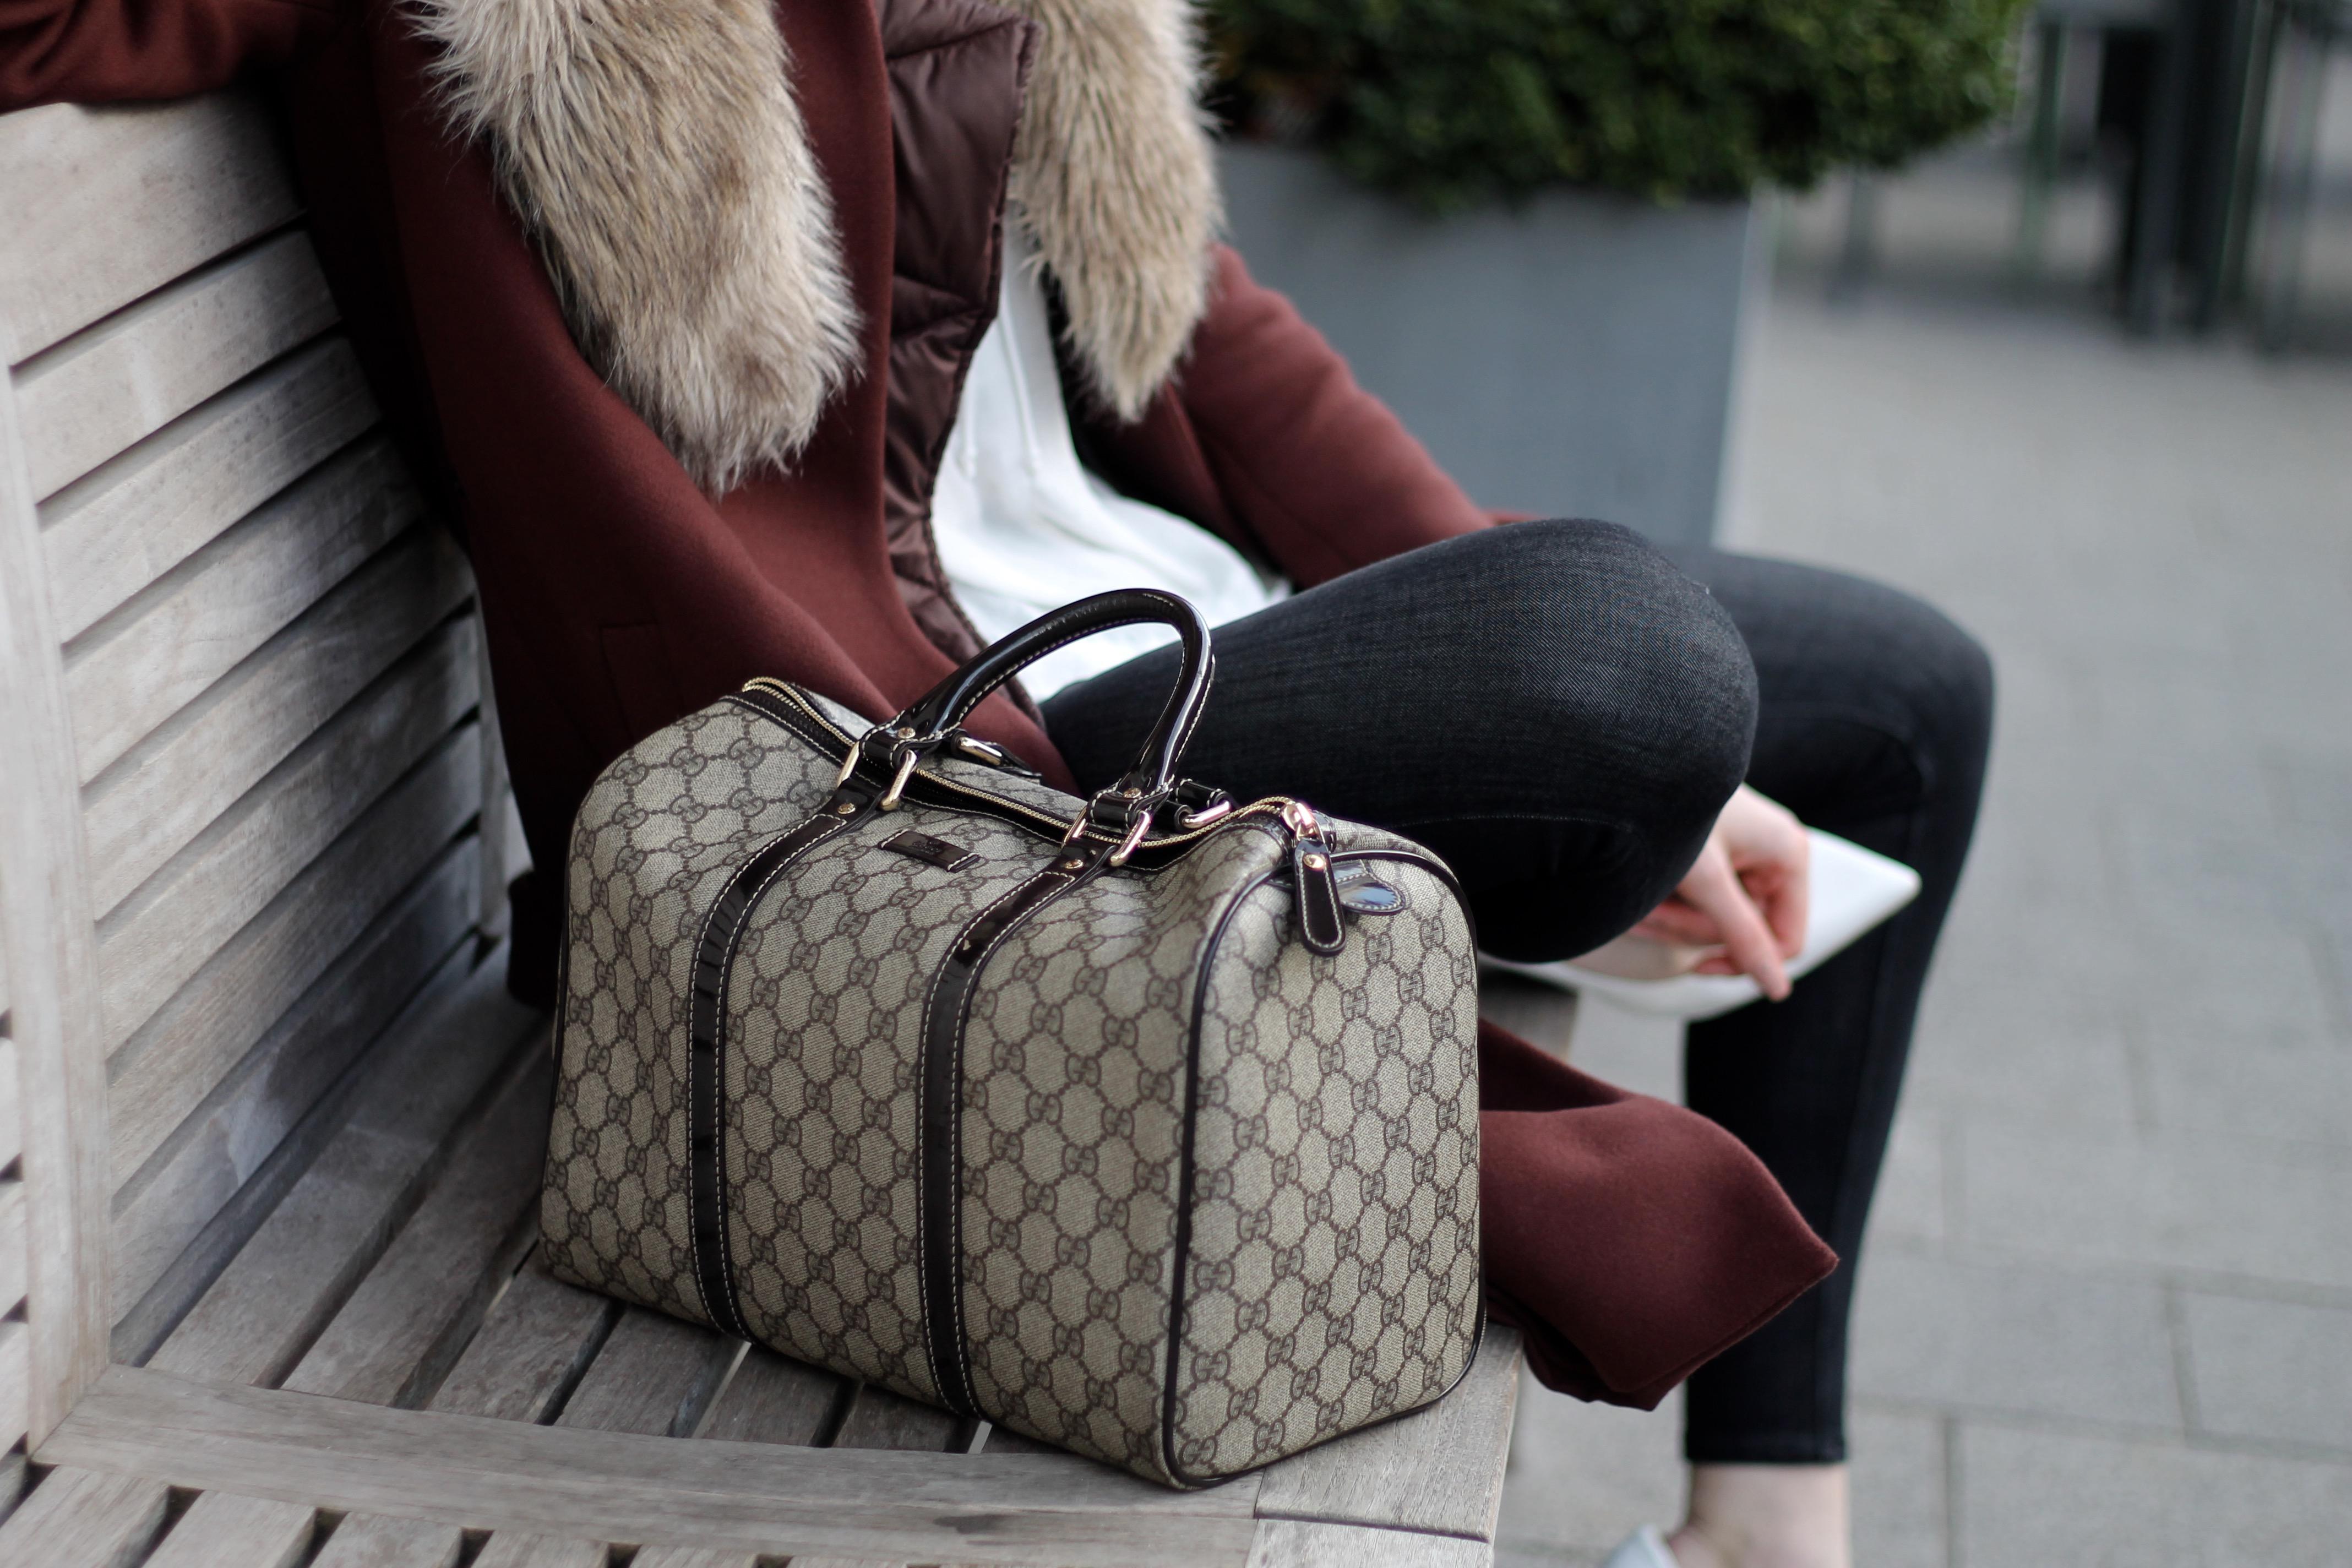 MON MODE | Fashion Blogger | Berlin Street Style | Fashion Trends | Berlin Fashion| Brussels| Travel Blogger| Belgium